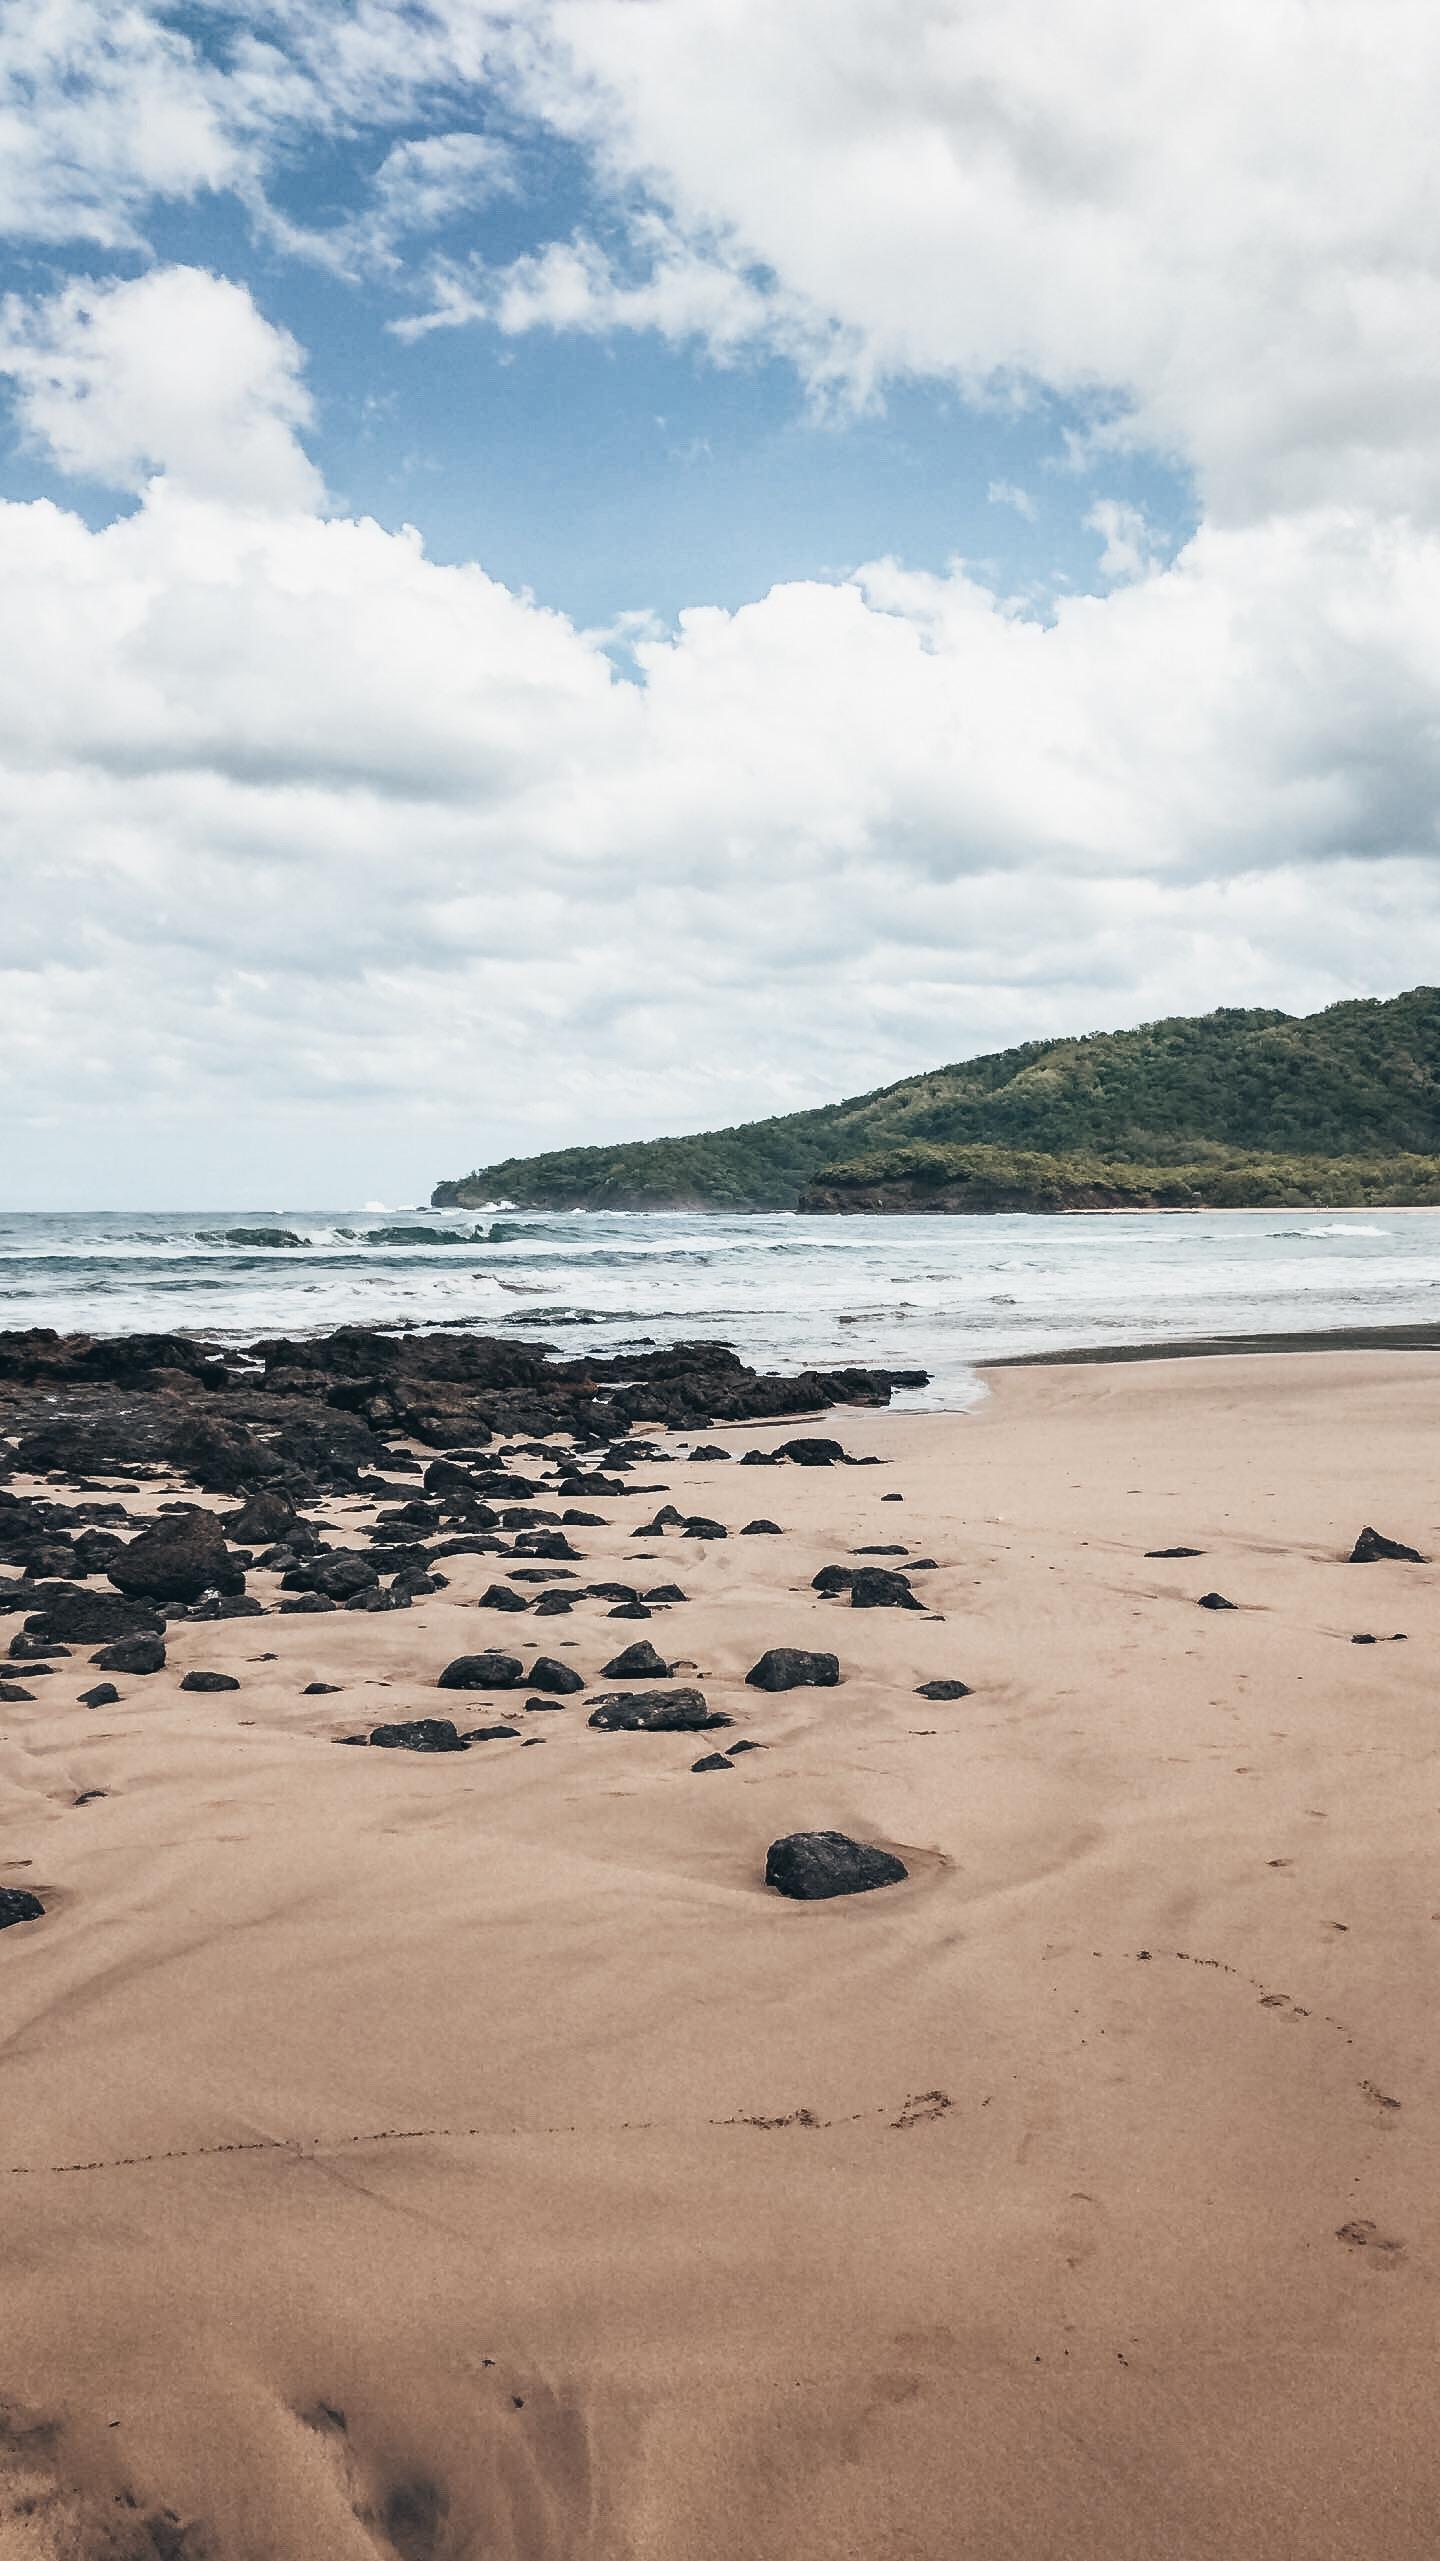 Surfing playa negra triodyssey.JPG